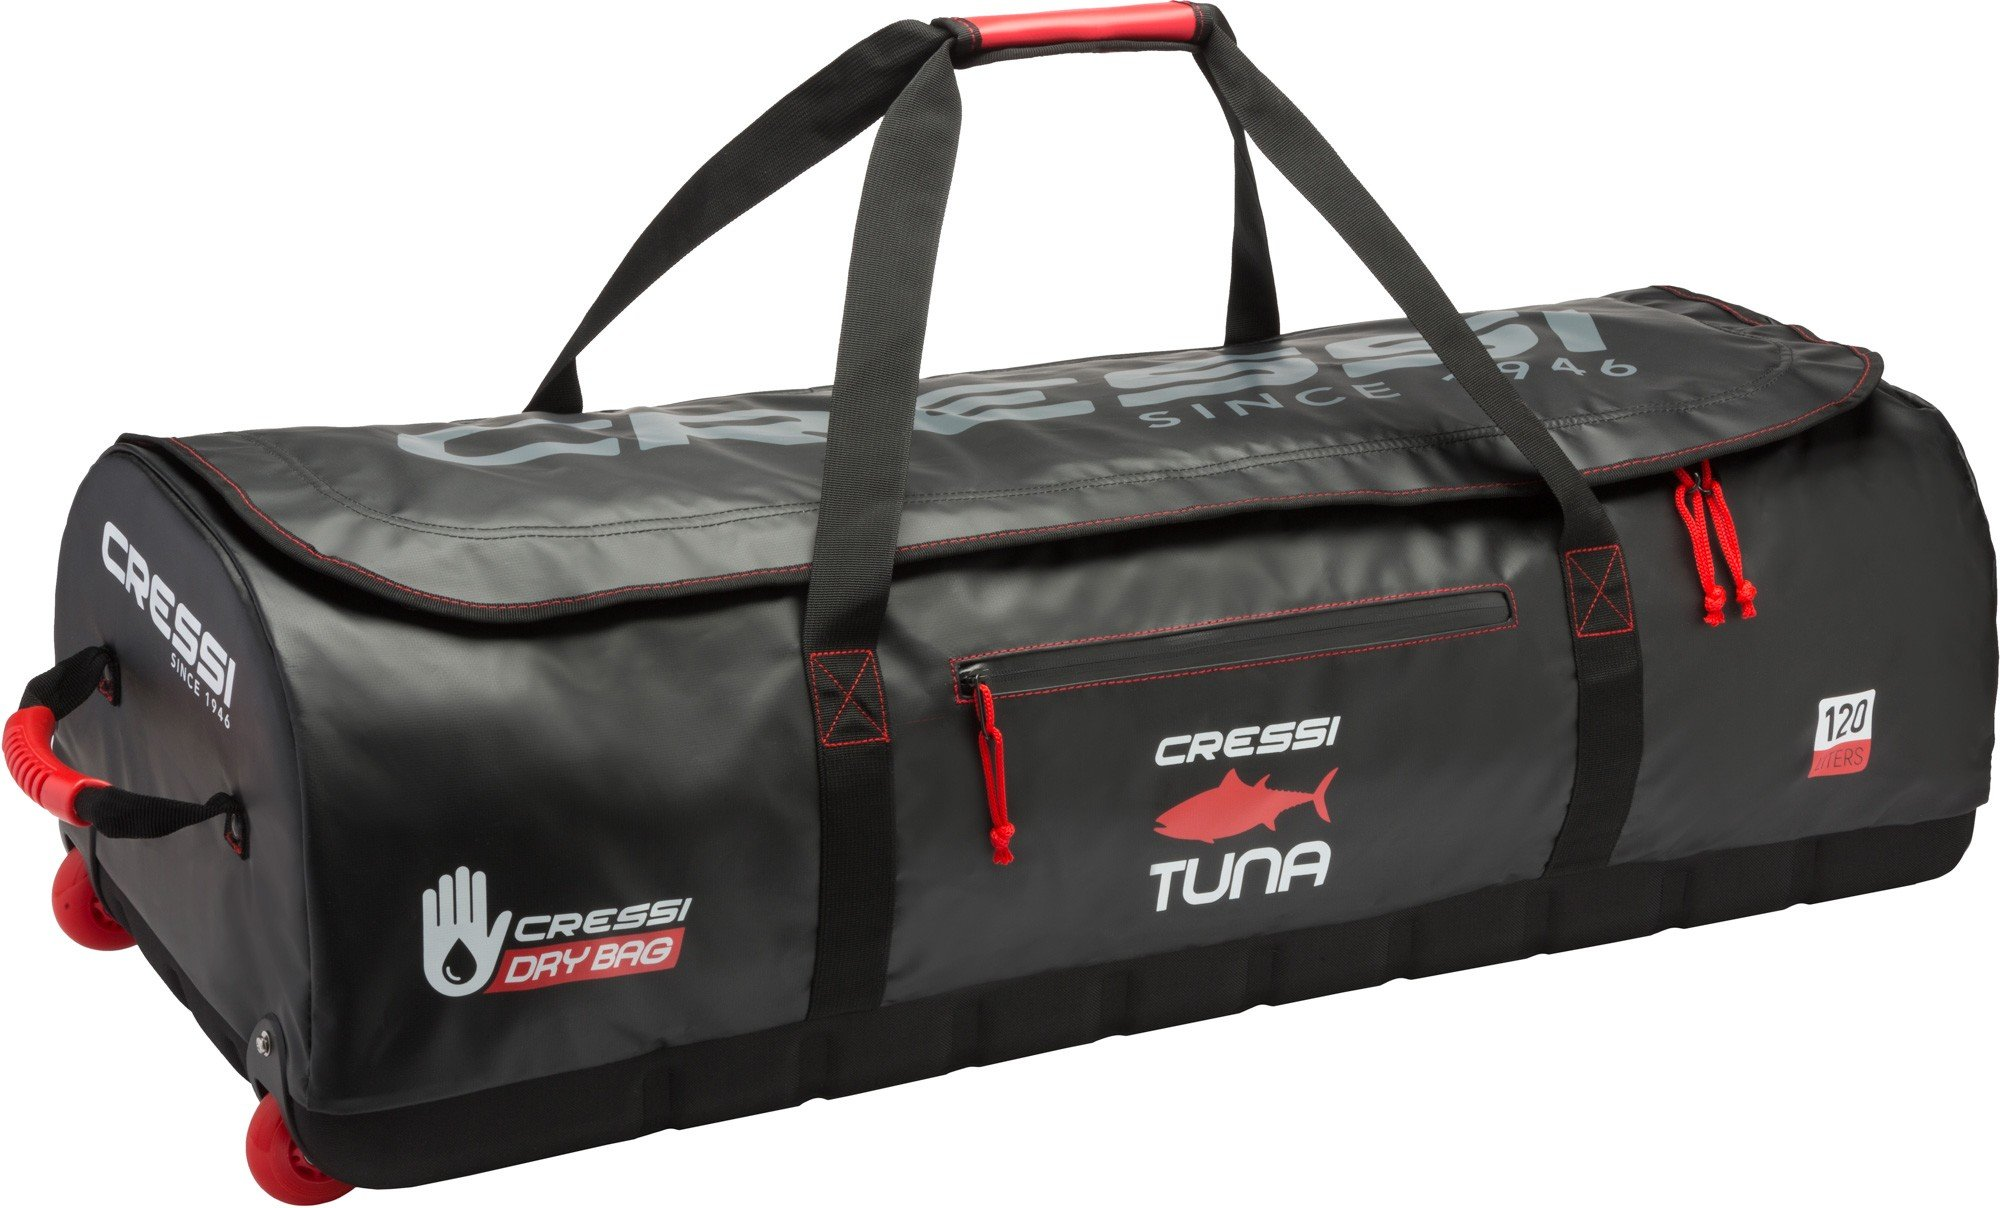 Cressi Tuna Wheel Bag